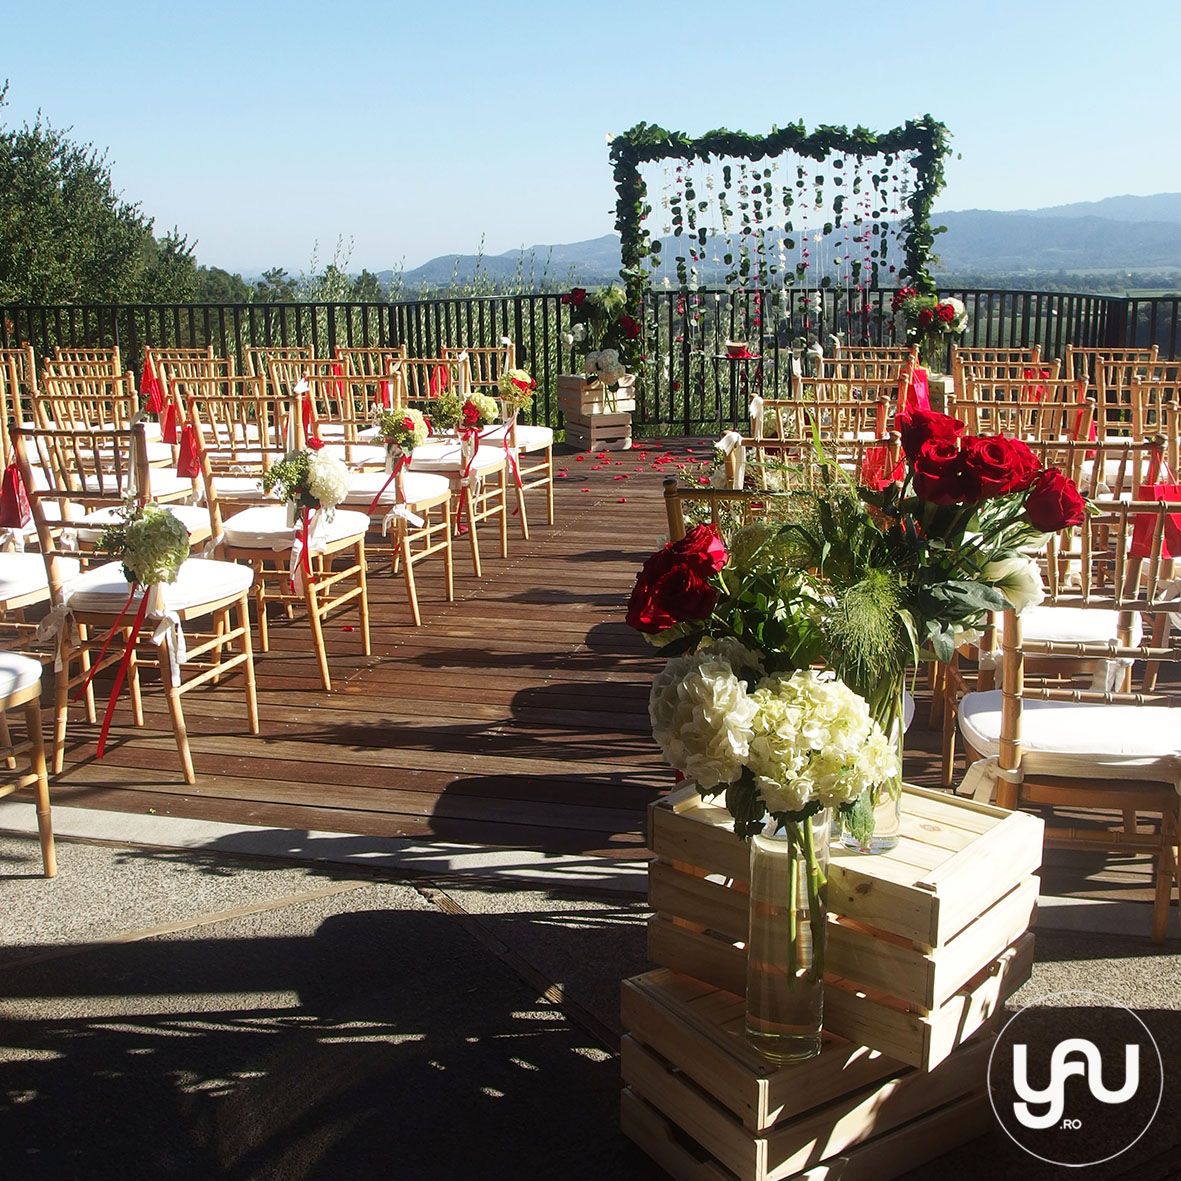 nunta-romaneasca-_-yau-events-2016-_-auberge-du-soleil-_-napa-valley-us-_-foto-brian-macstay-_-elenatoader-43